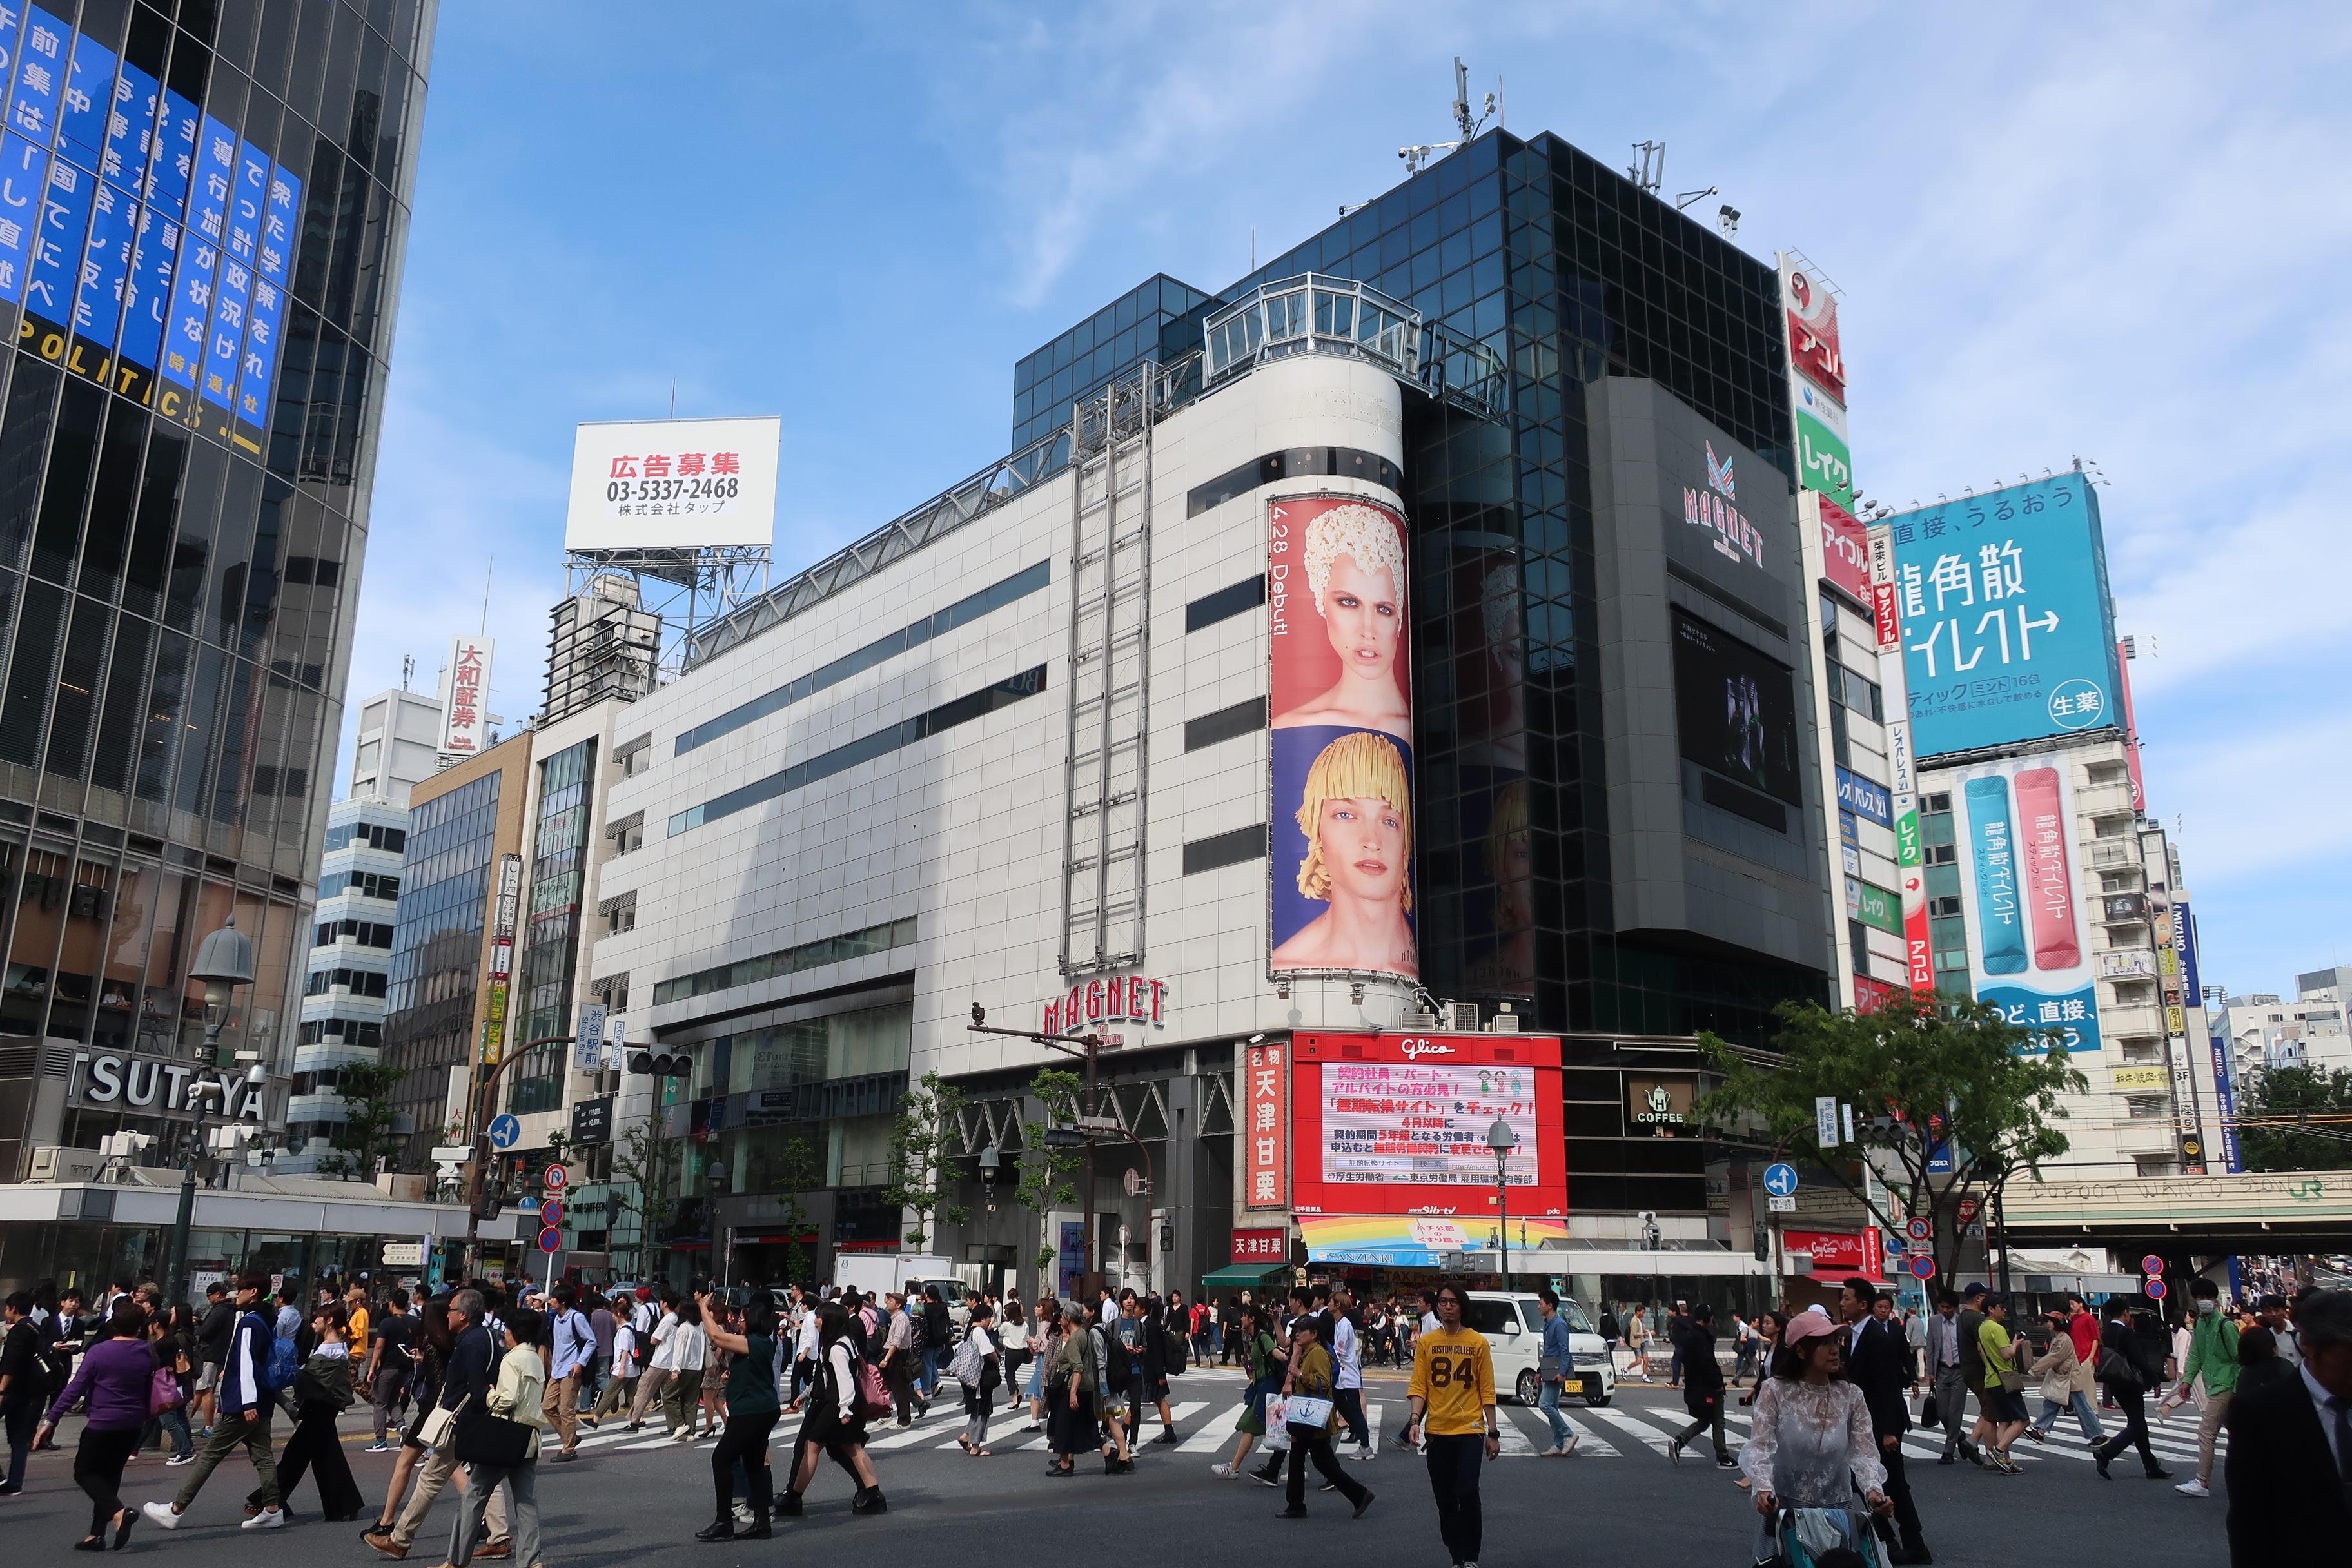 20180426magnet 1 - 109メンズ渋谷/渋谷文化を発信「MAGNET by SHIBUYA109」に一新